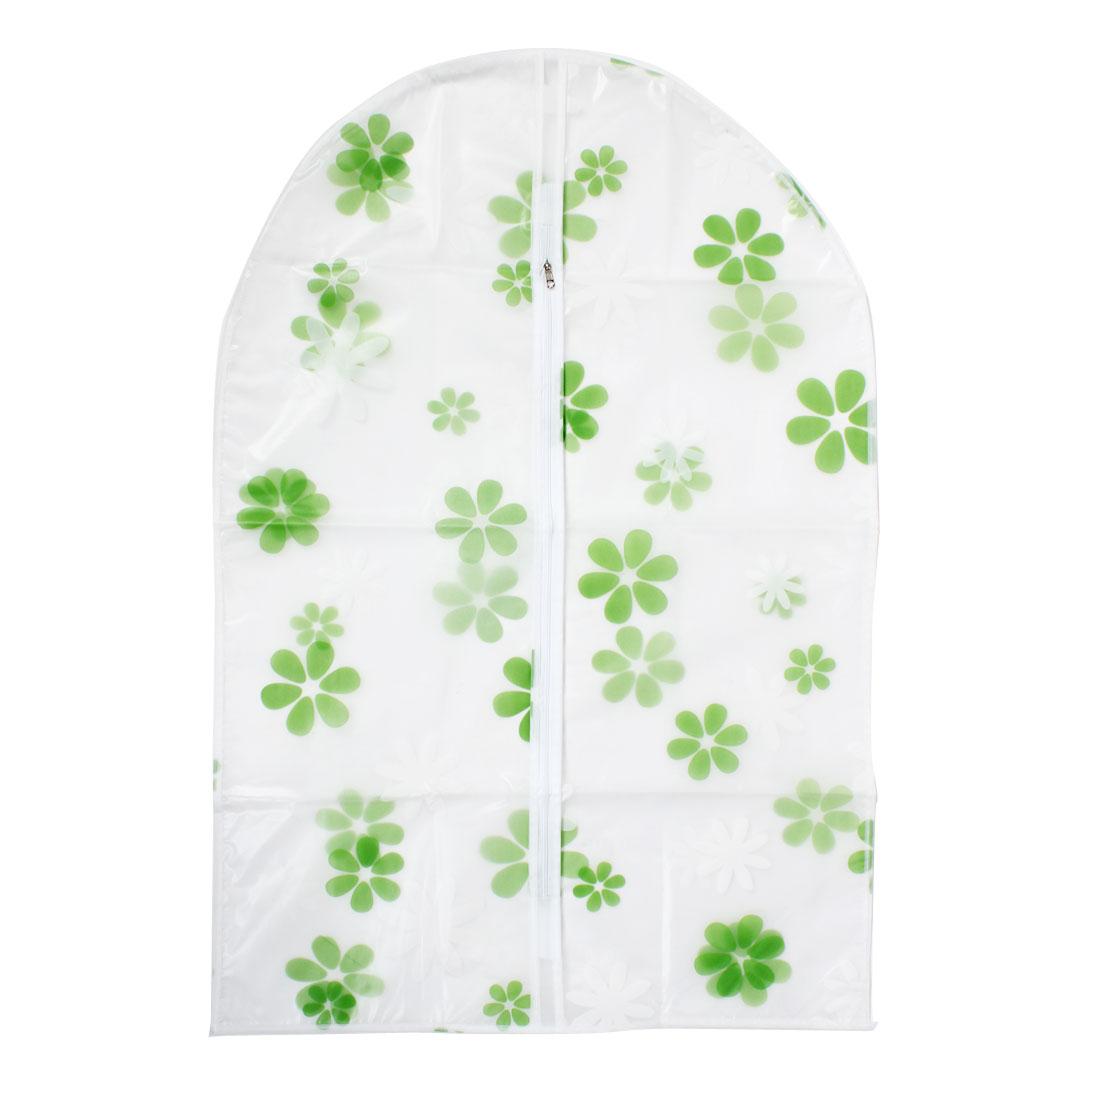 "Clothes Suit Garment PEVA Flower Printed Dustproof Cover Bag 35"" Length"